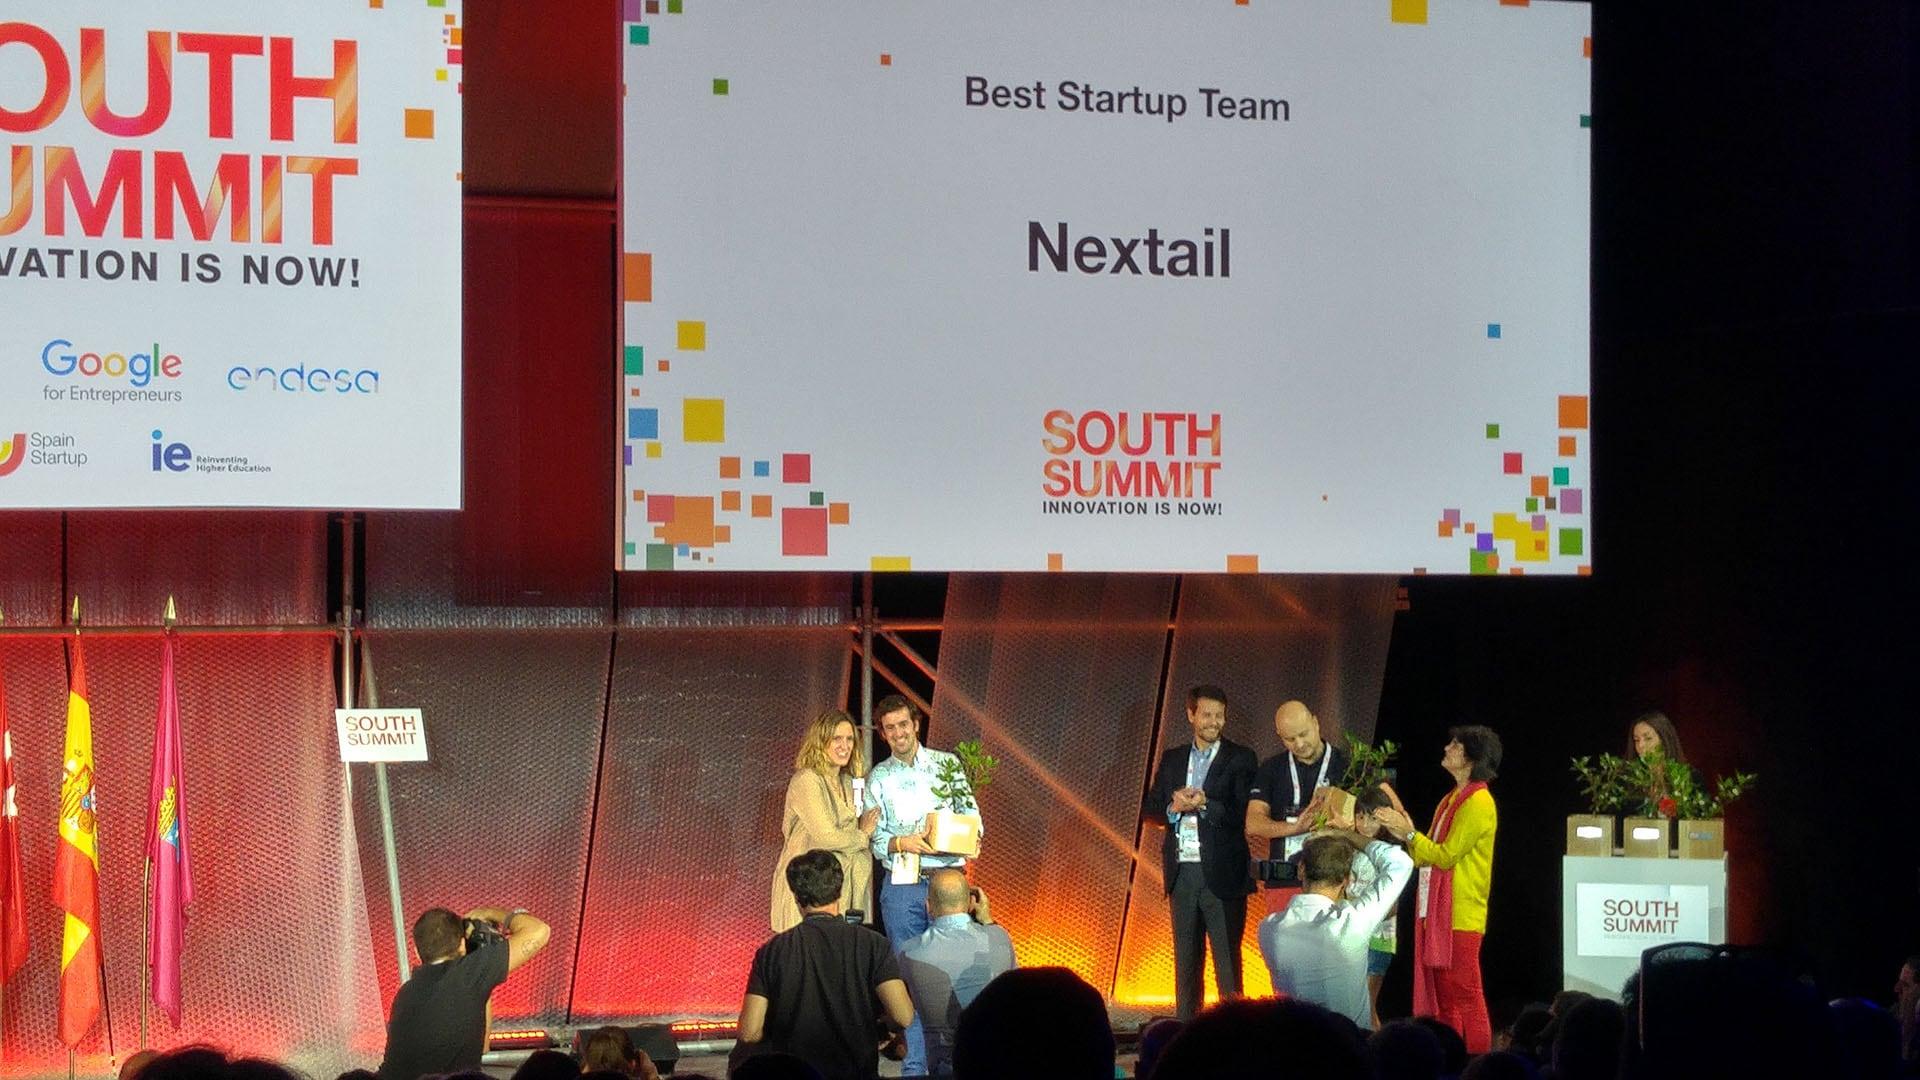 Nextail Best Team and Best Lifestyle & Fashion startup at SouthSummit